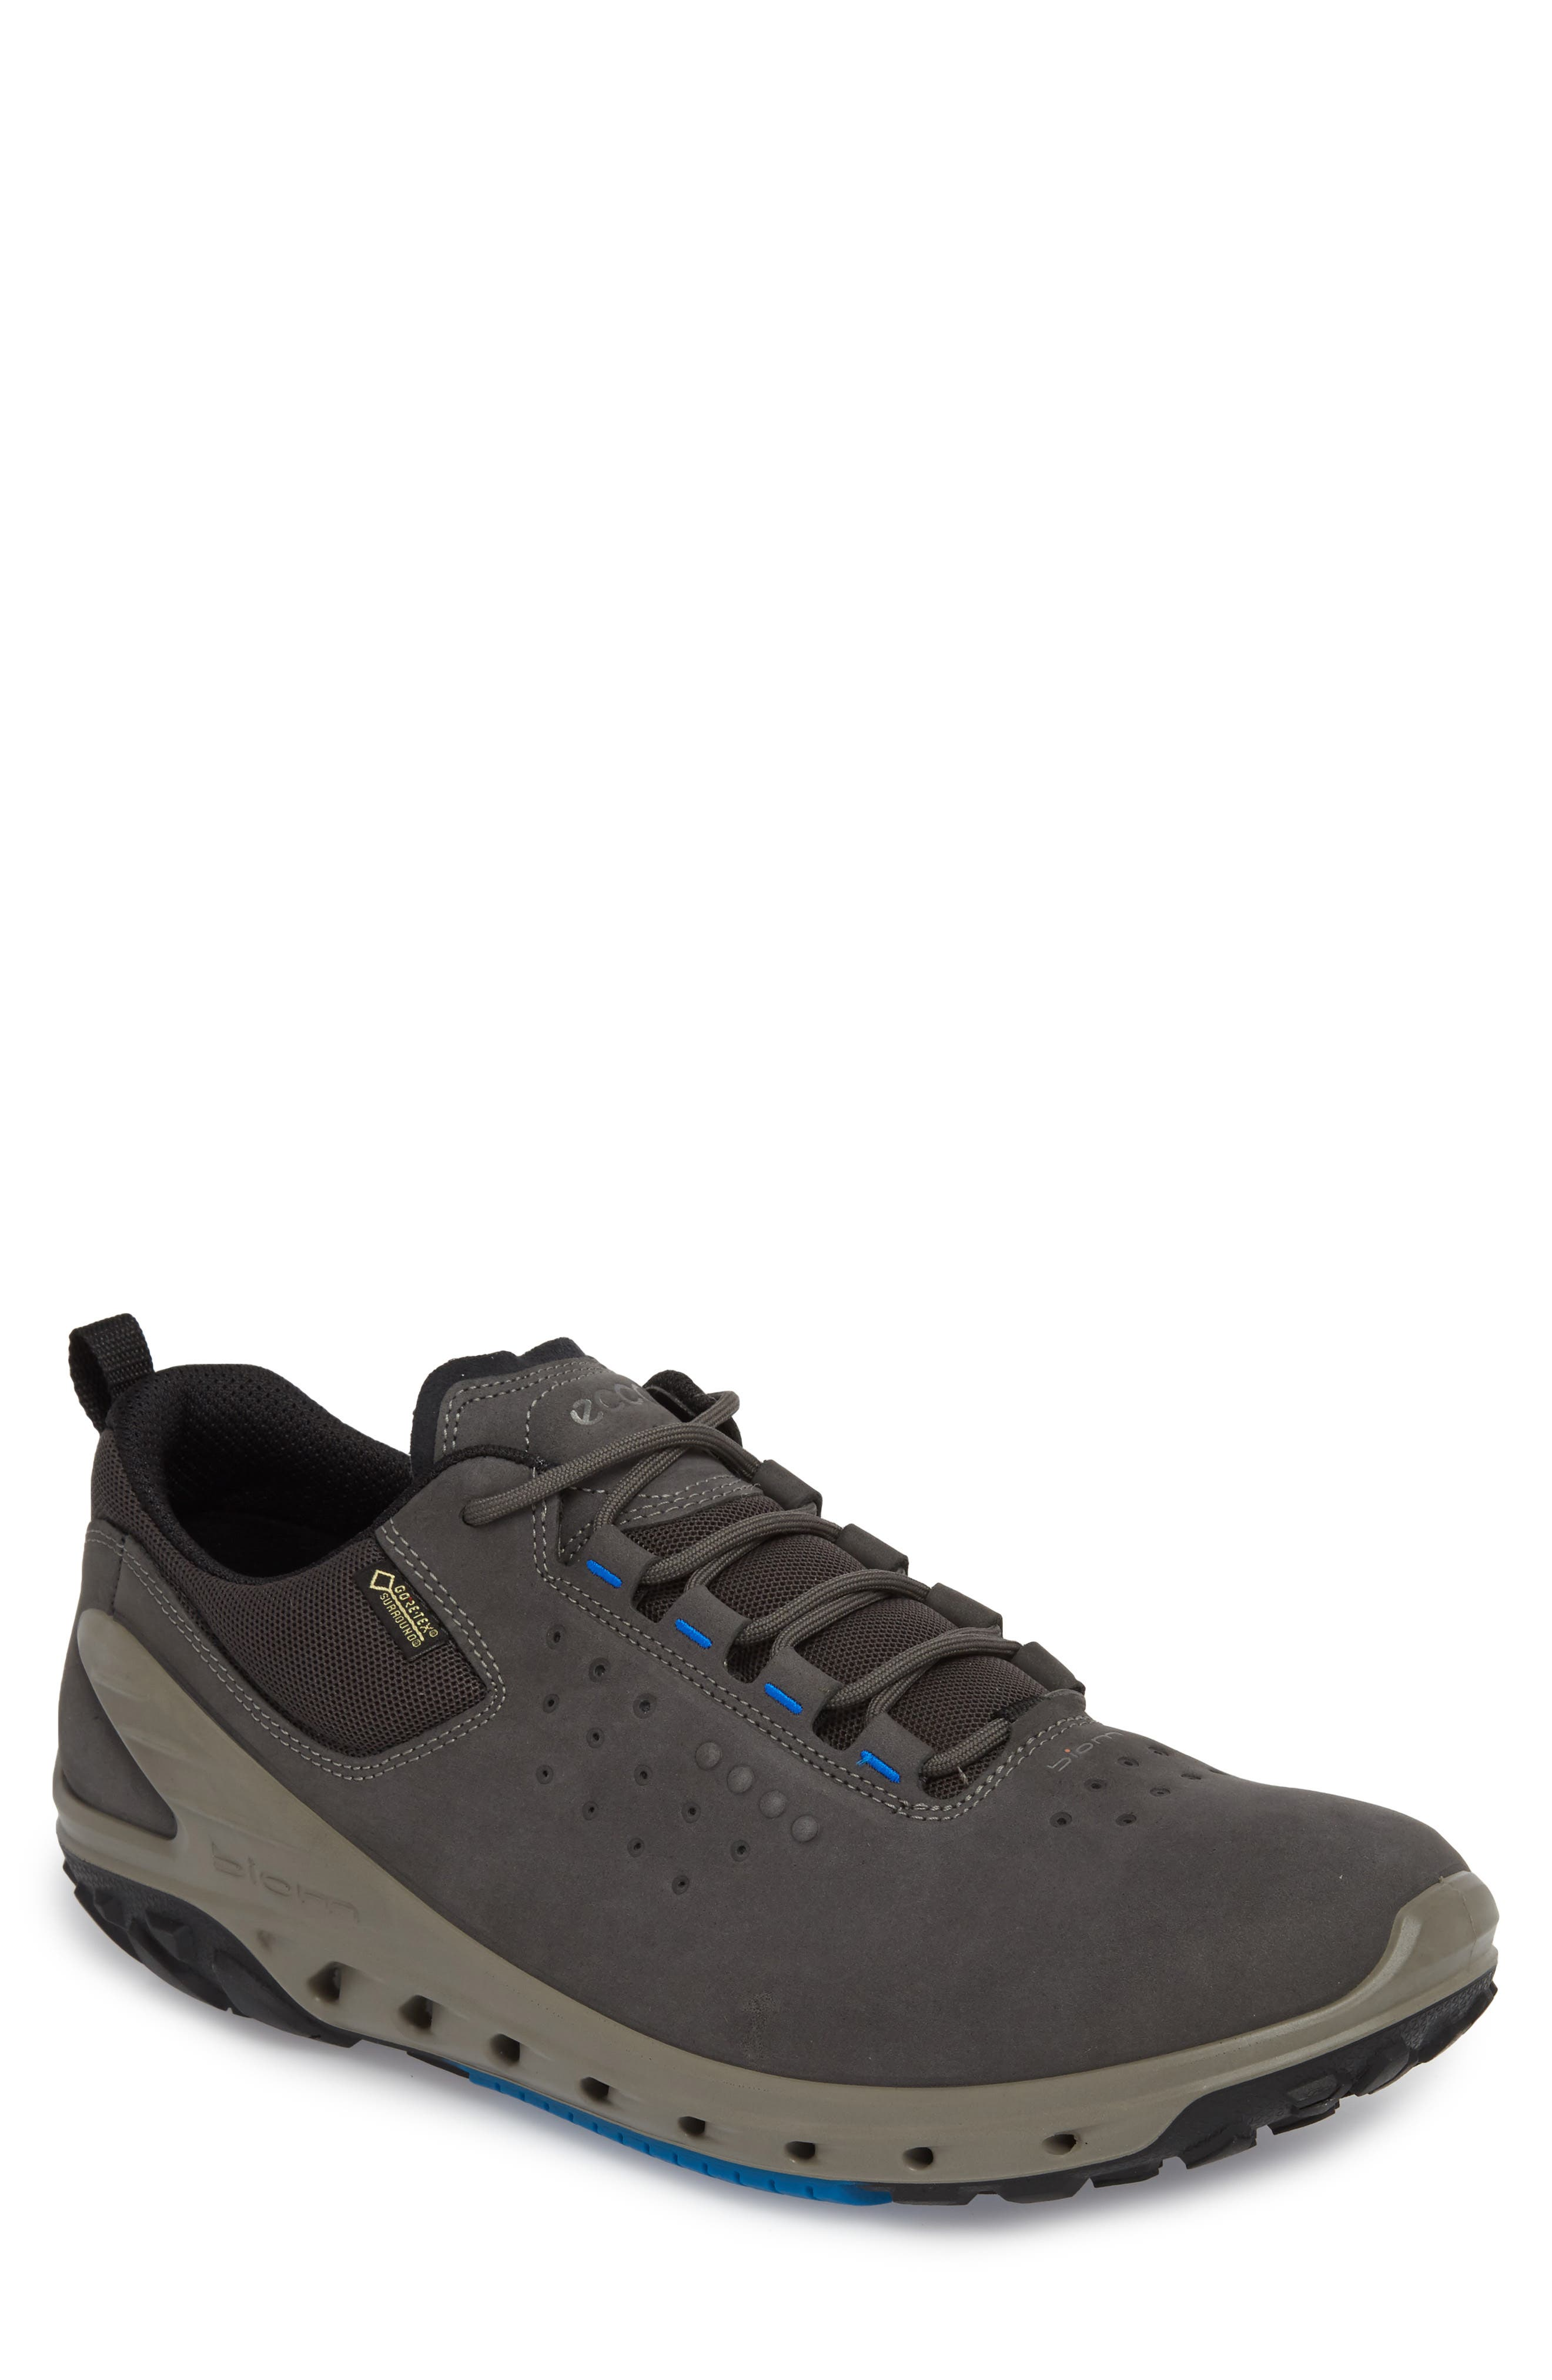 Biom Venture GTX Sneaker,                             Main thumbnail 1, color,